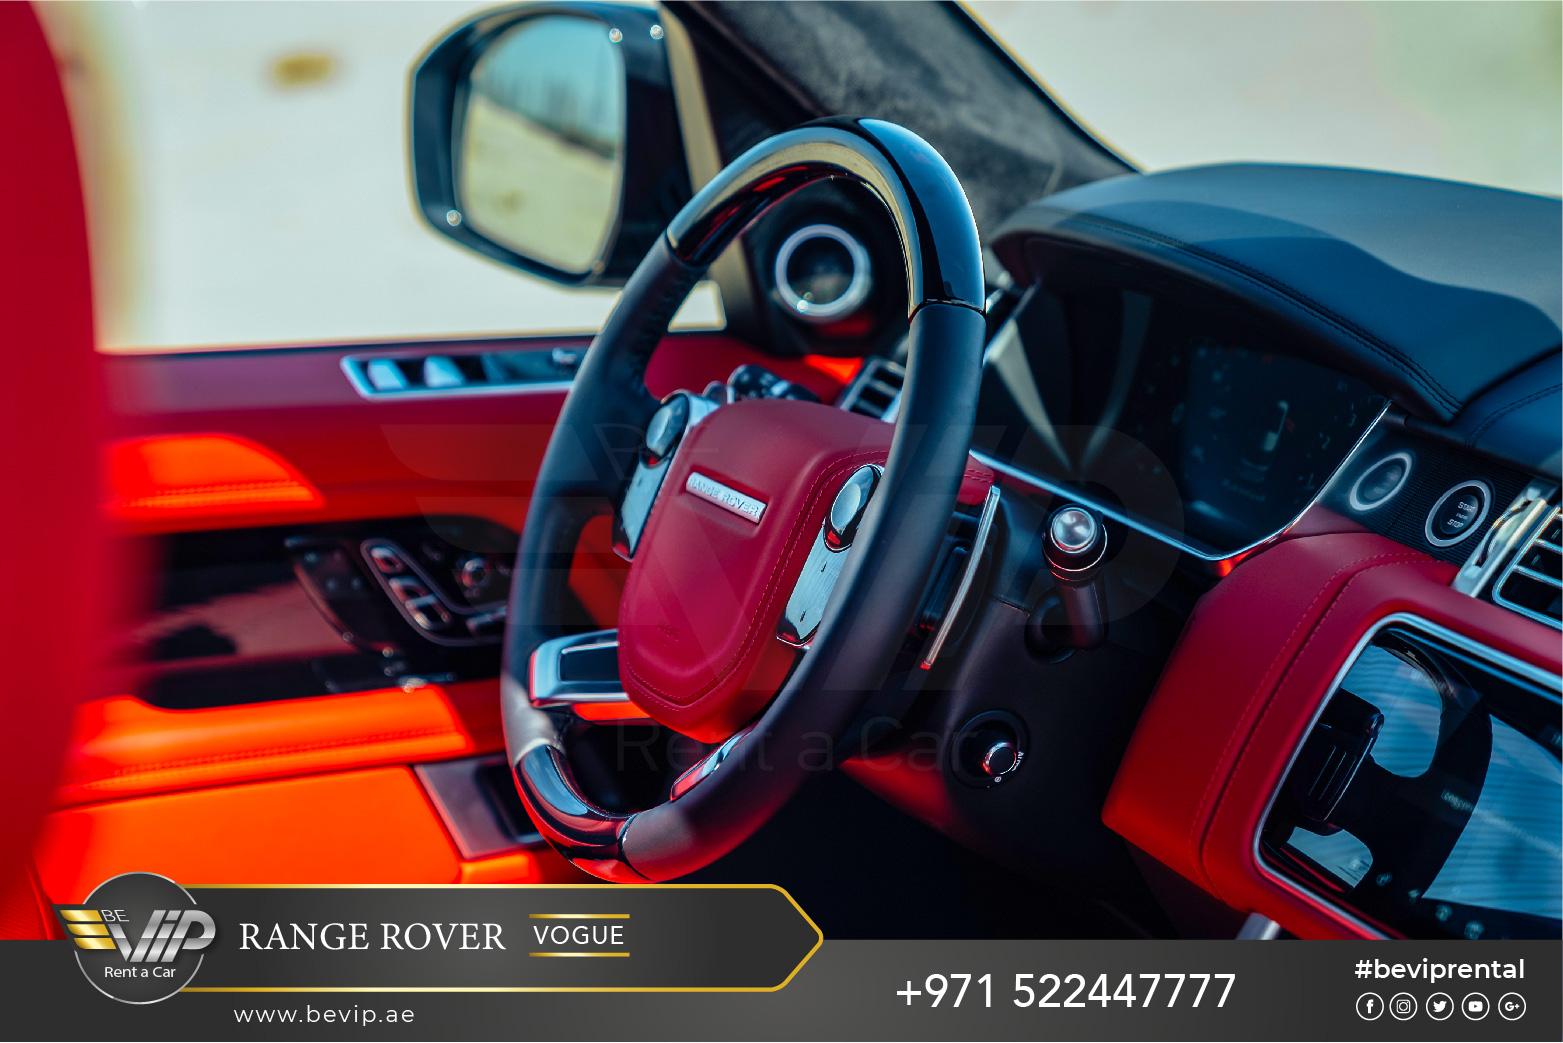 Luxury-car-rental-in-dubai_Range-Rover-for-rent-in-Dubai_-11.jpg